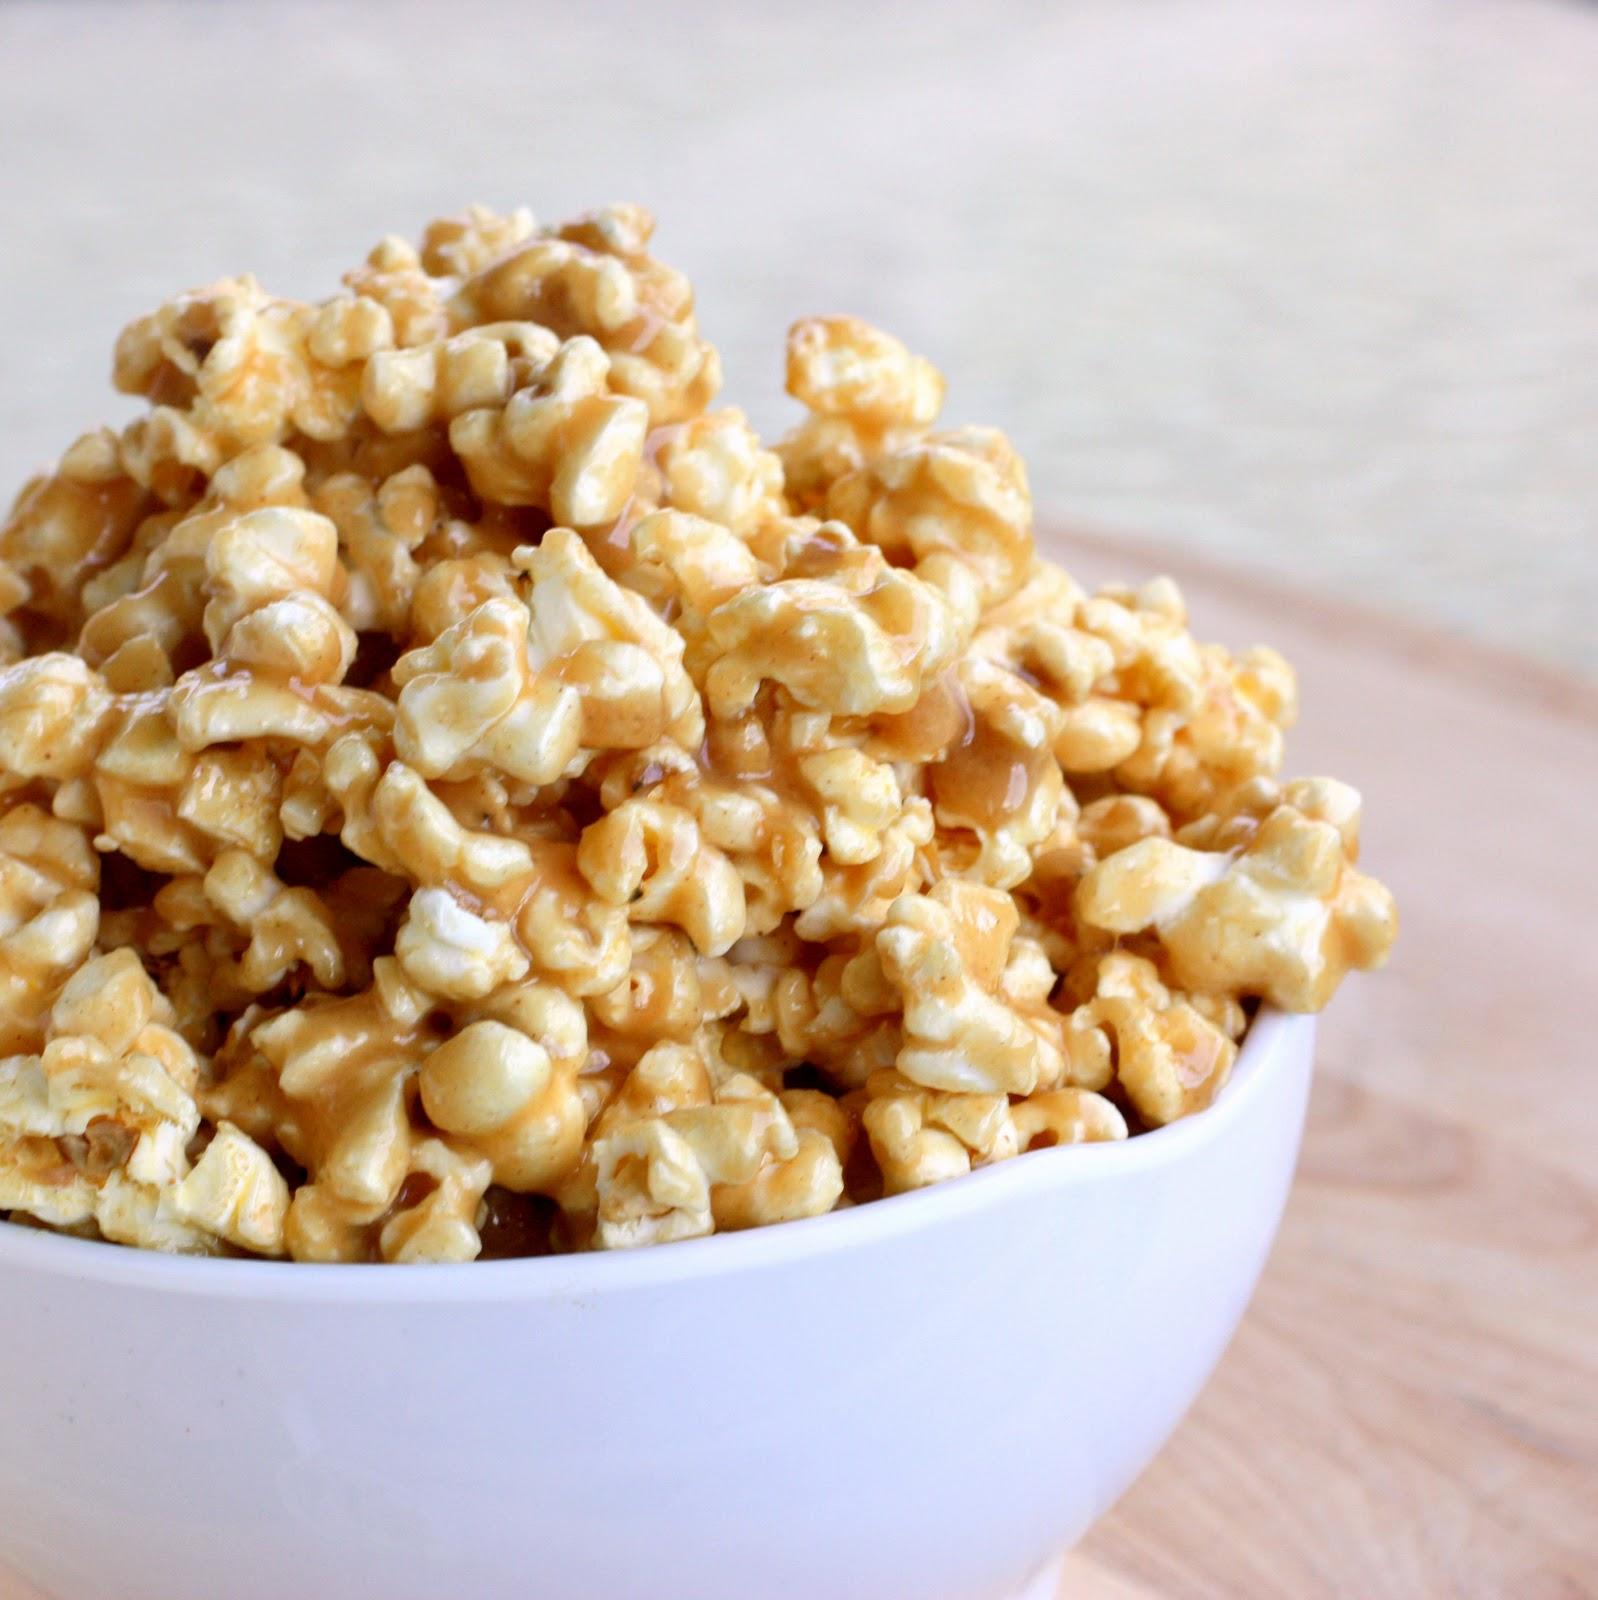 peanut-butter-popcorn-warm.jpg